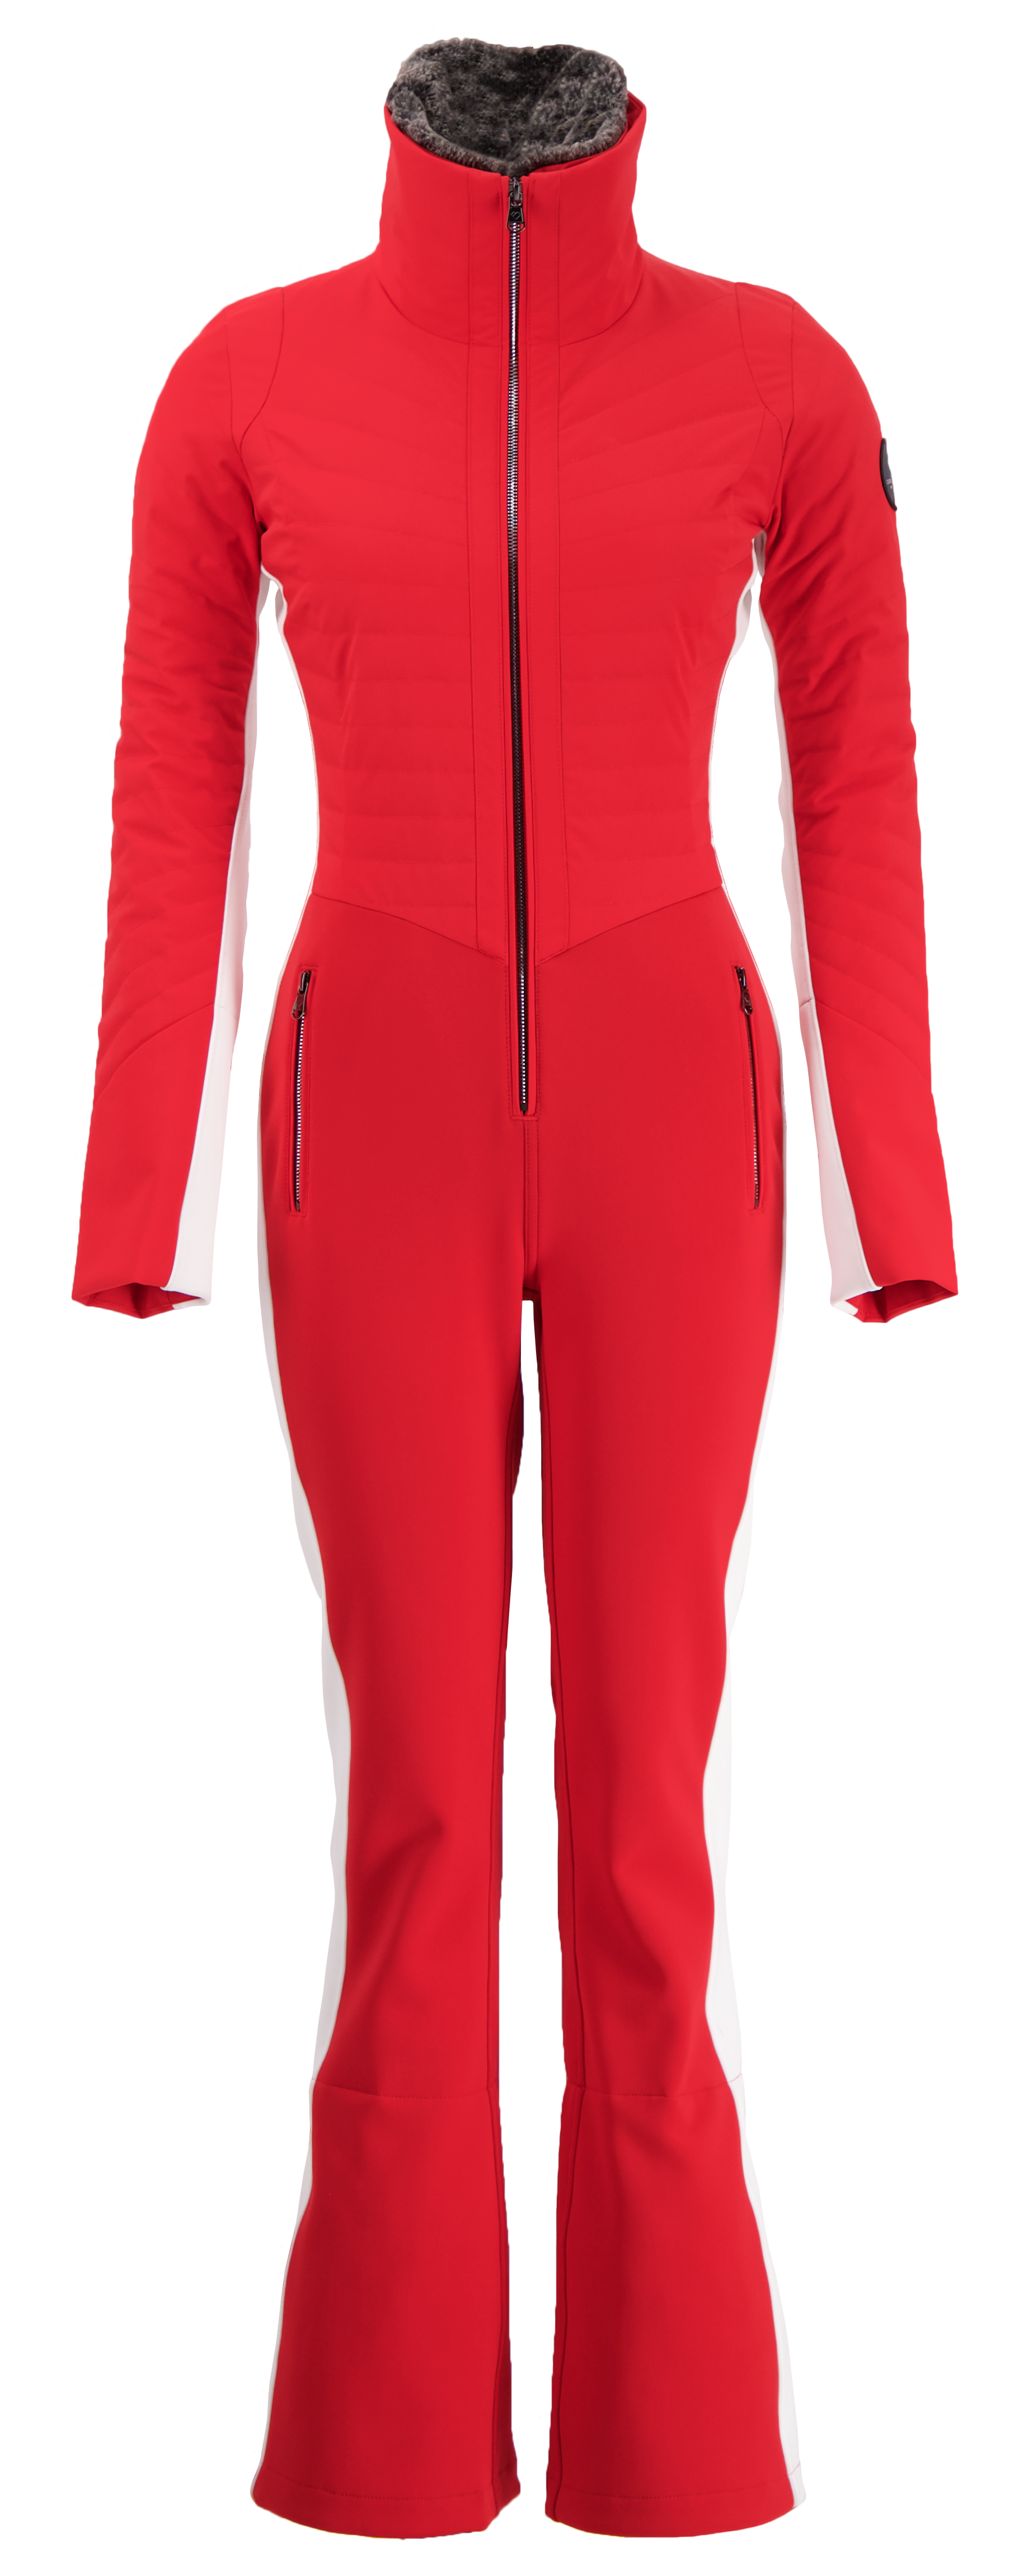 Mikaela Shiffrin Pyeong Chang 2018 Olympics